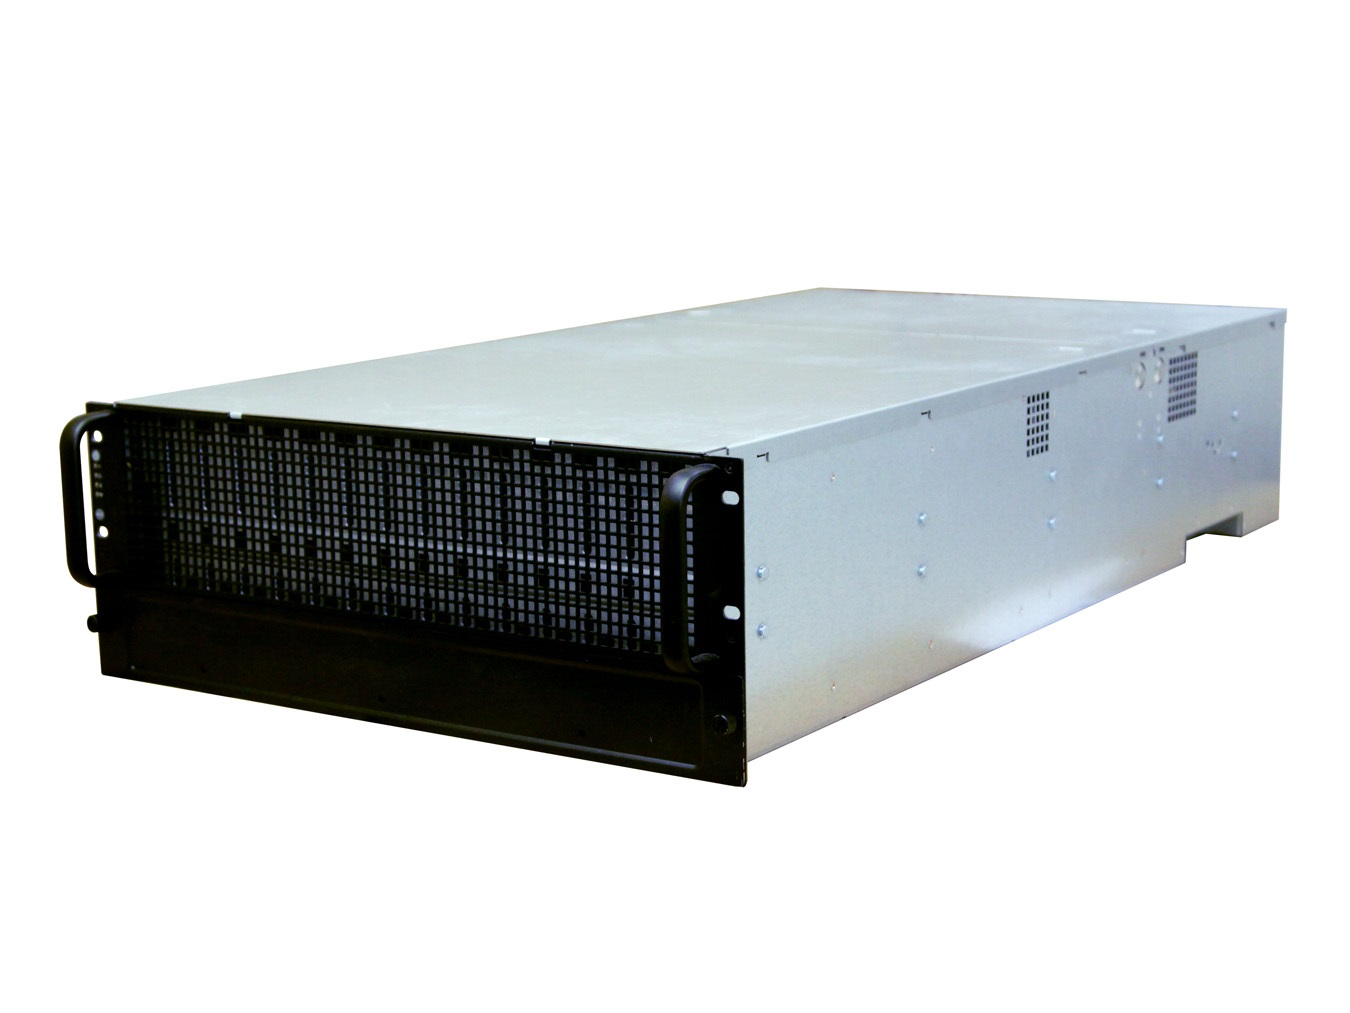 AIC J4060-01 XJ1-40601-02 4U 60-Bay 12Gb/s SAS JBOD